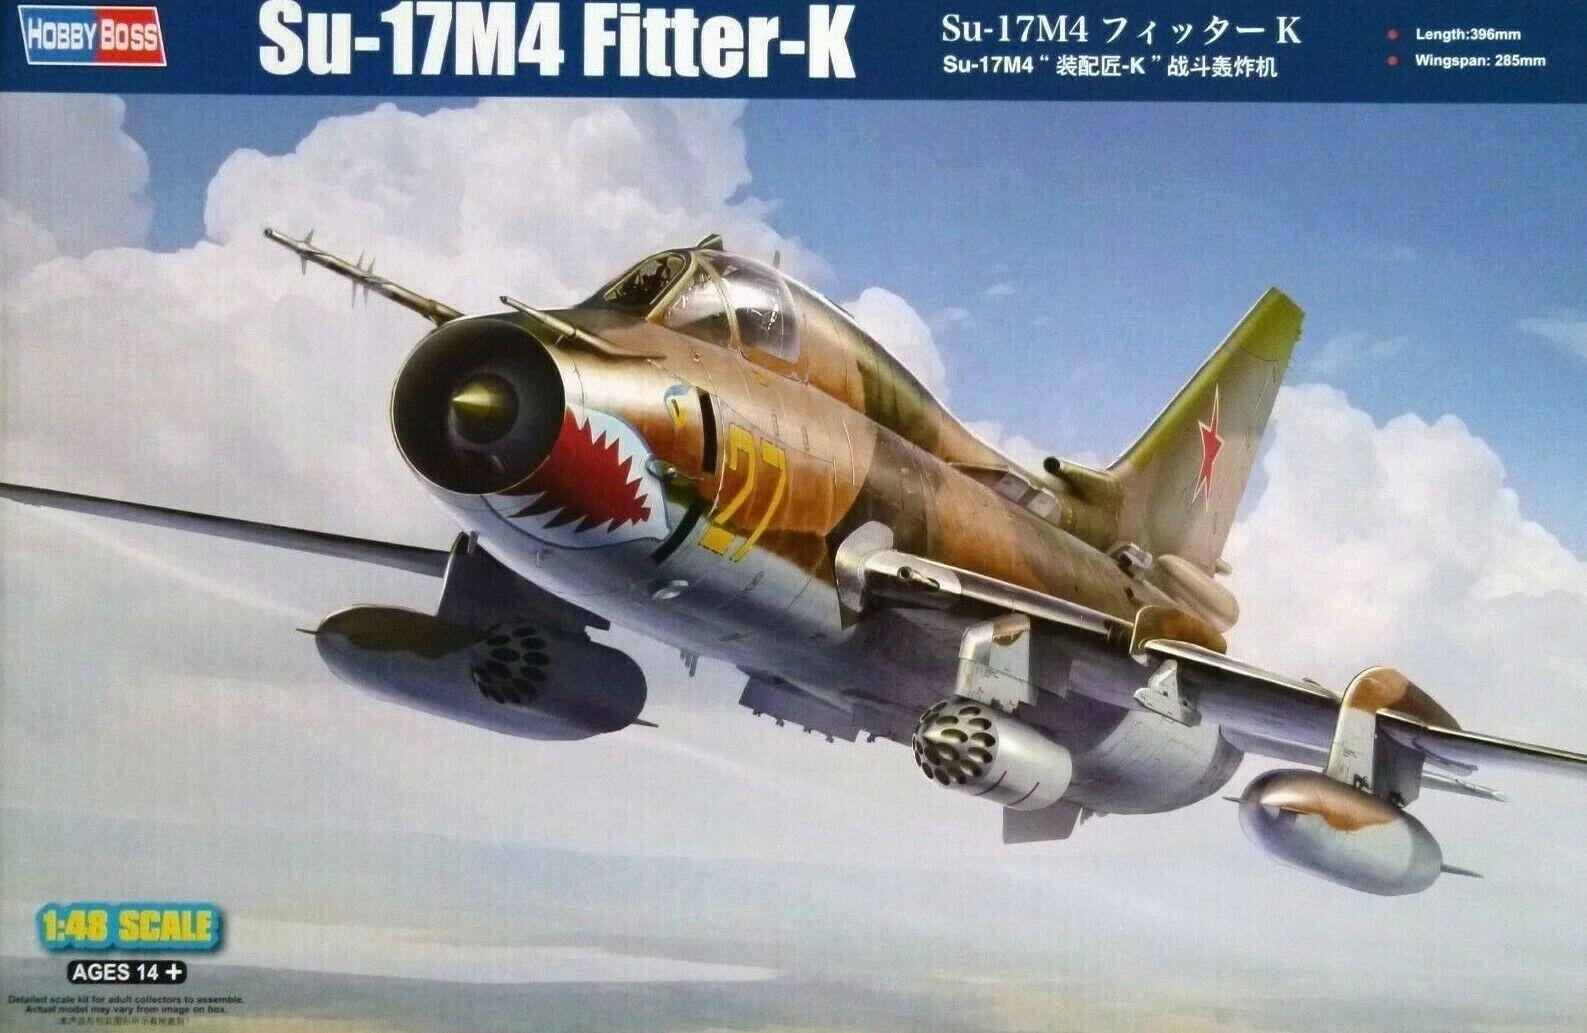 Hobbyboss 1 48 Sukhoi Su-17M4 Fitter-K Aircraft Model Kit